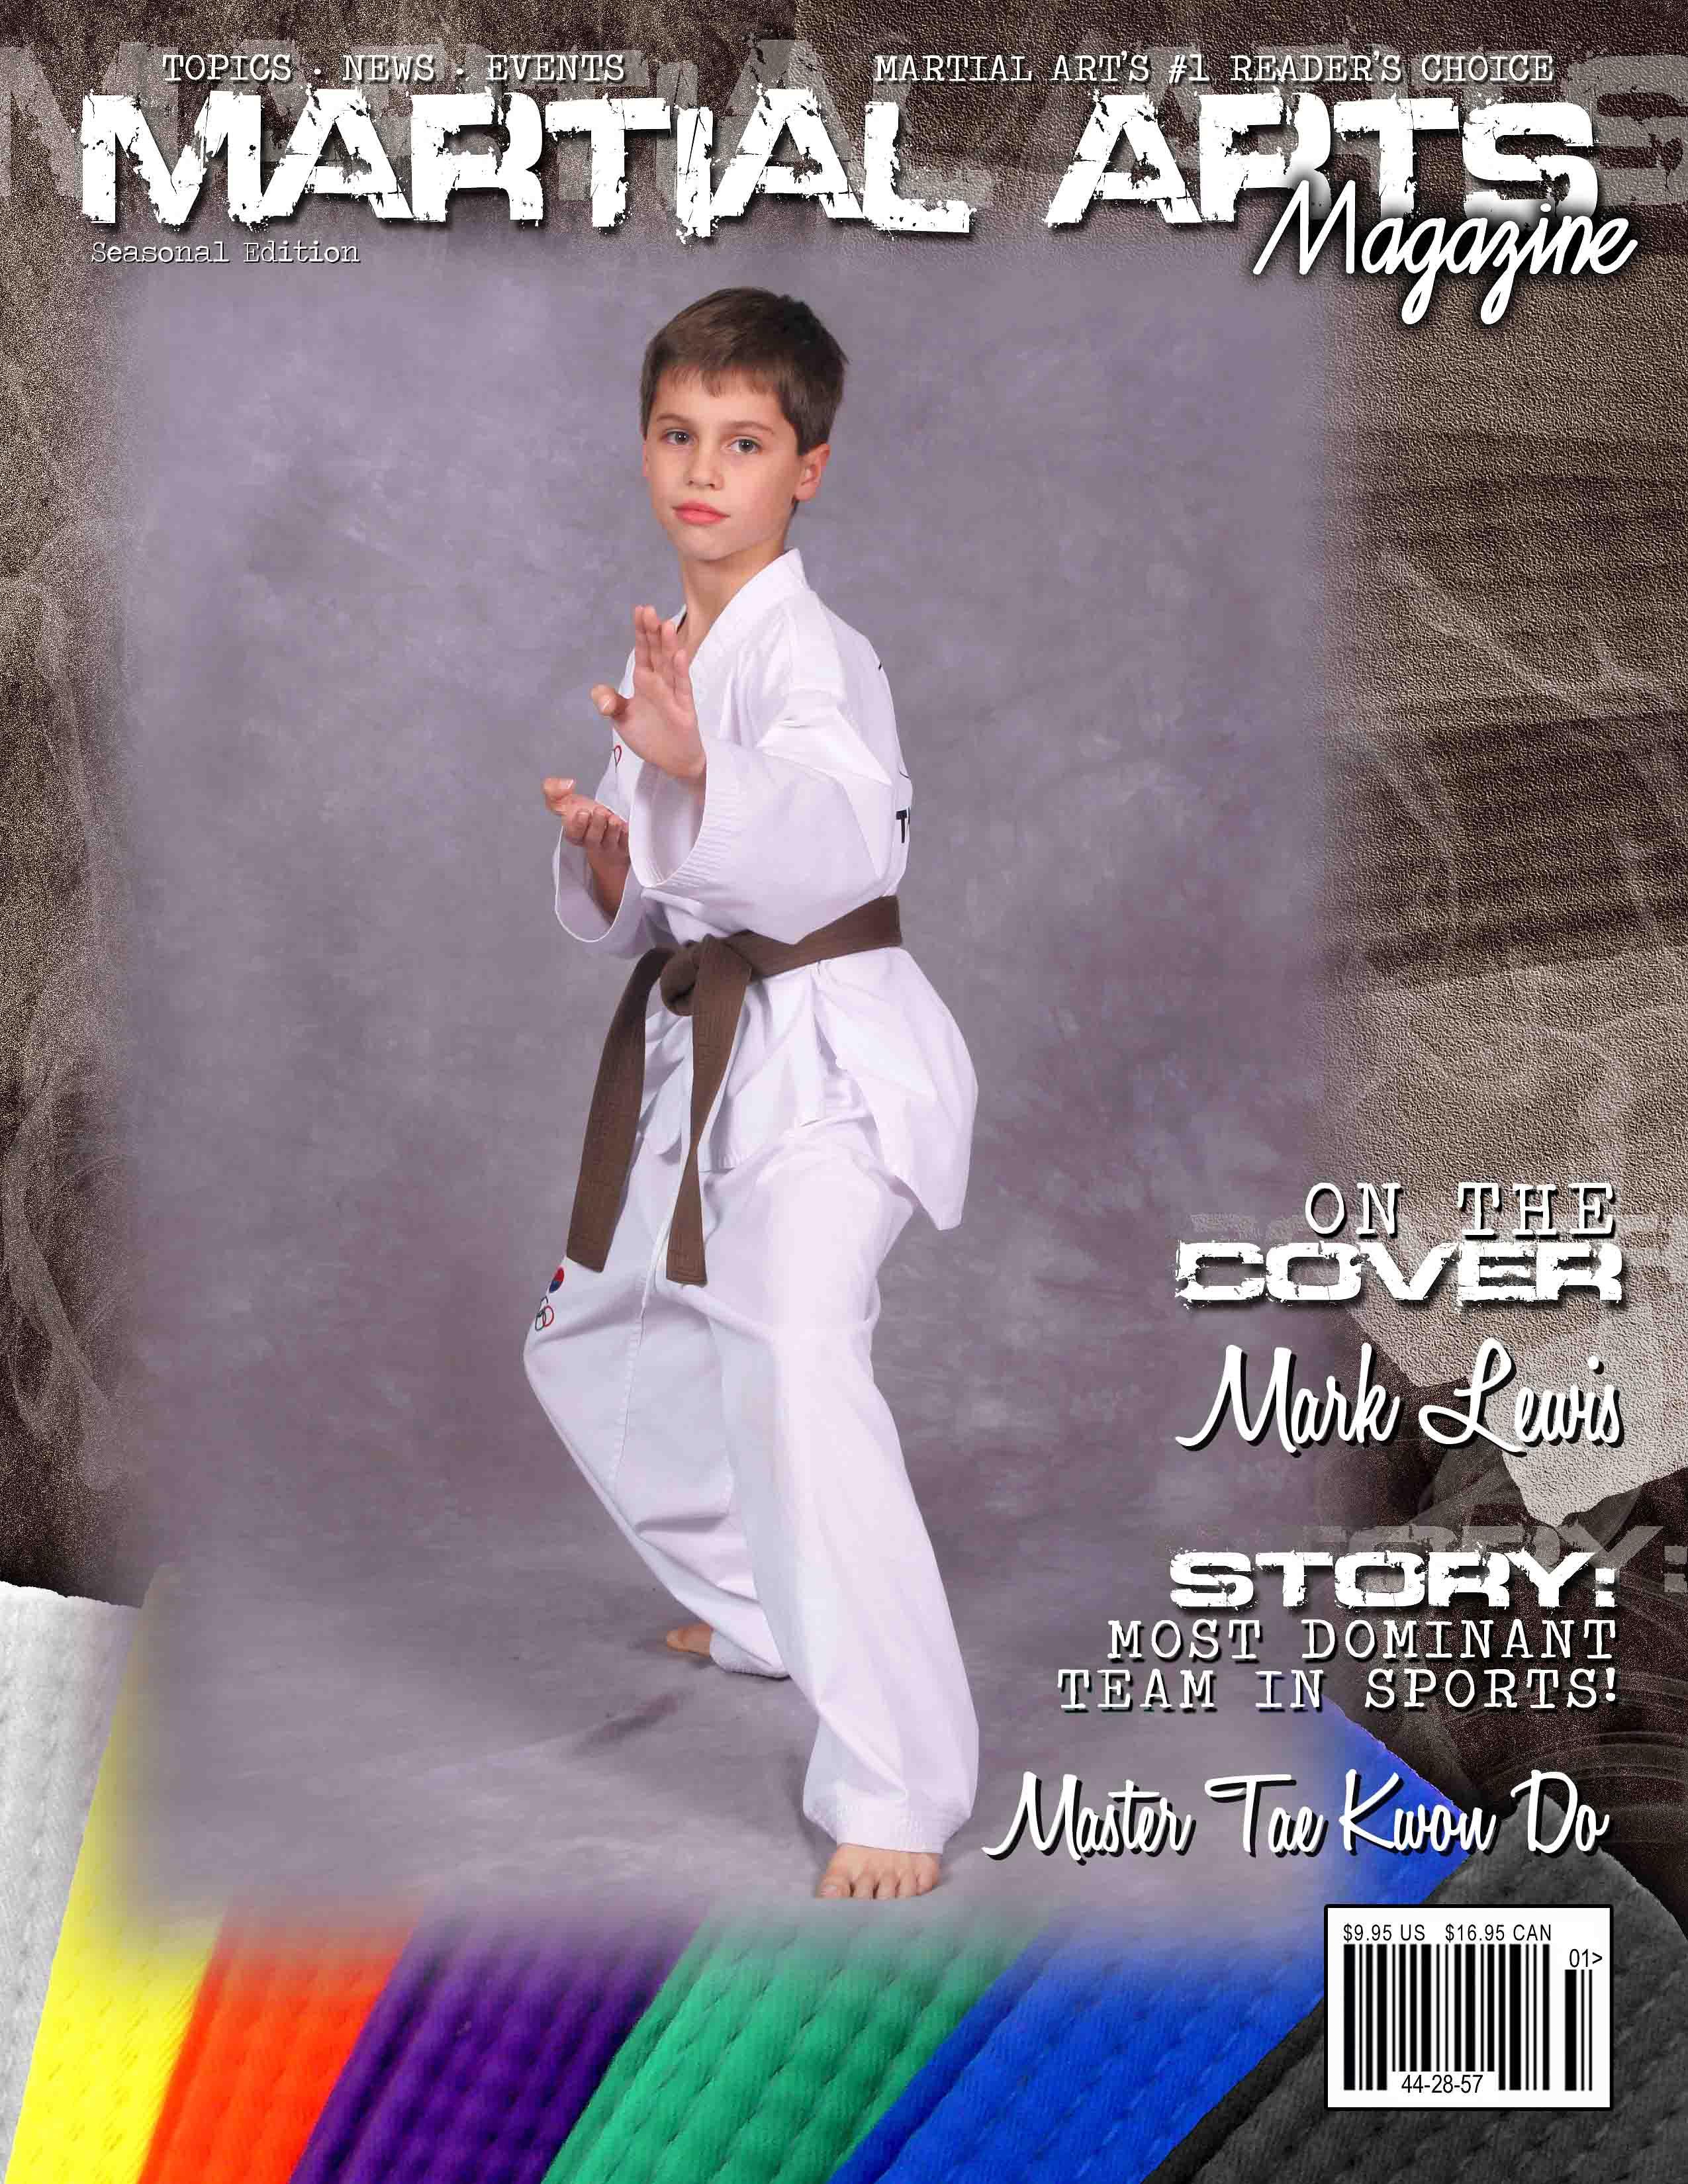 Martial+Arts_MagazineCover.jpg